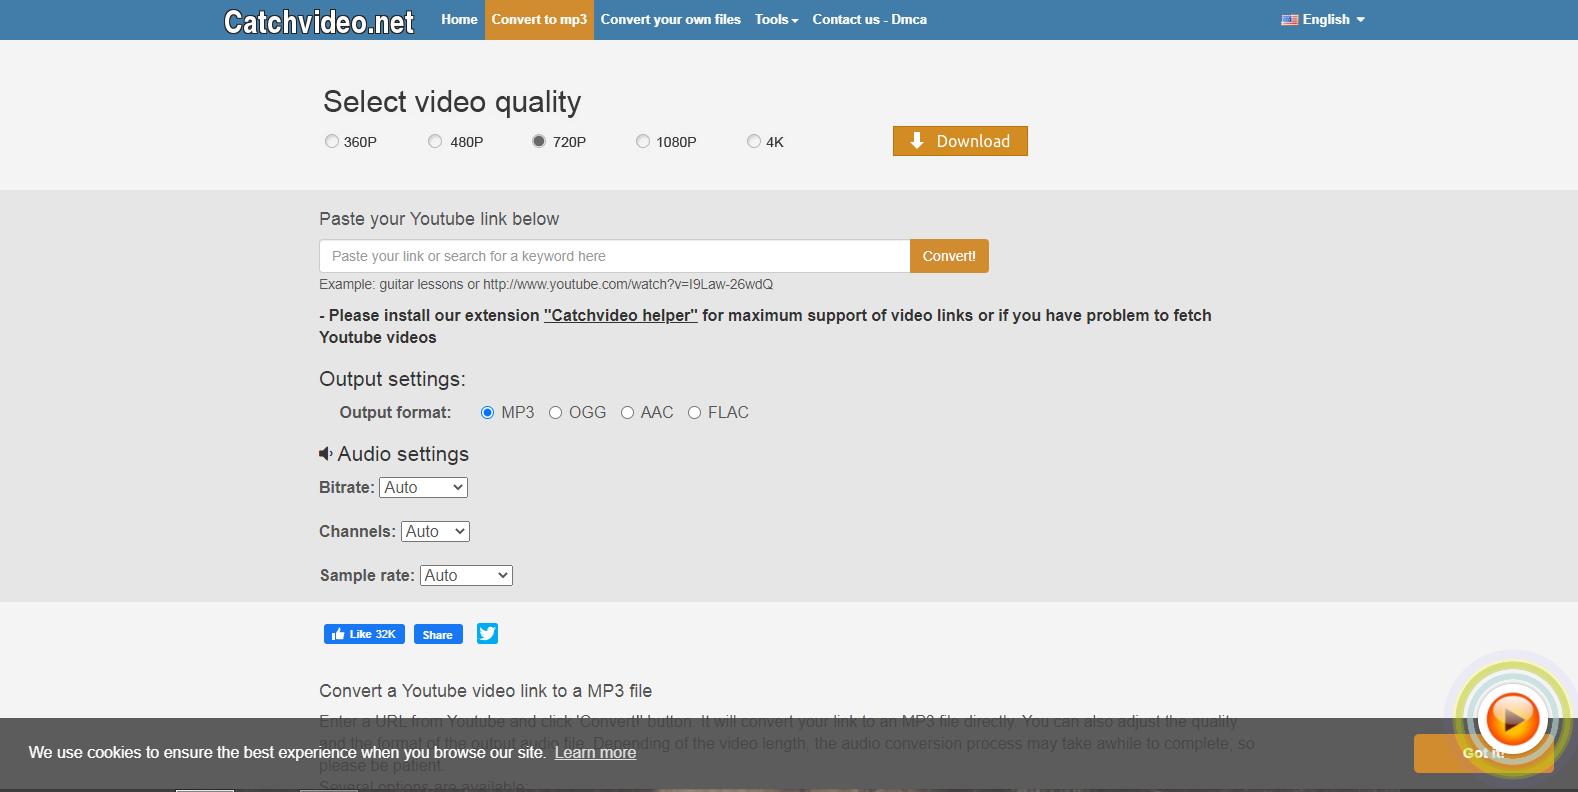 catch video net